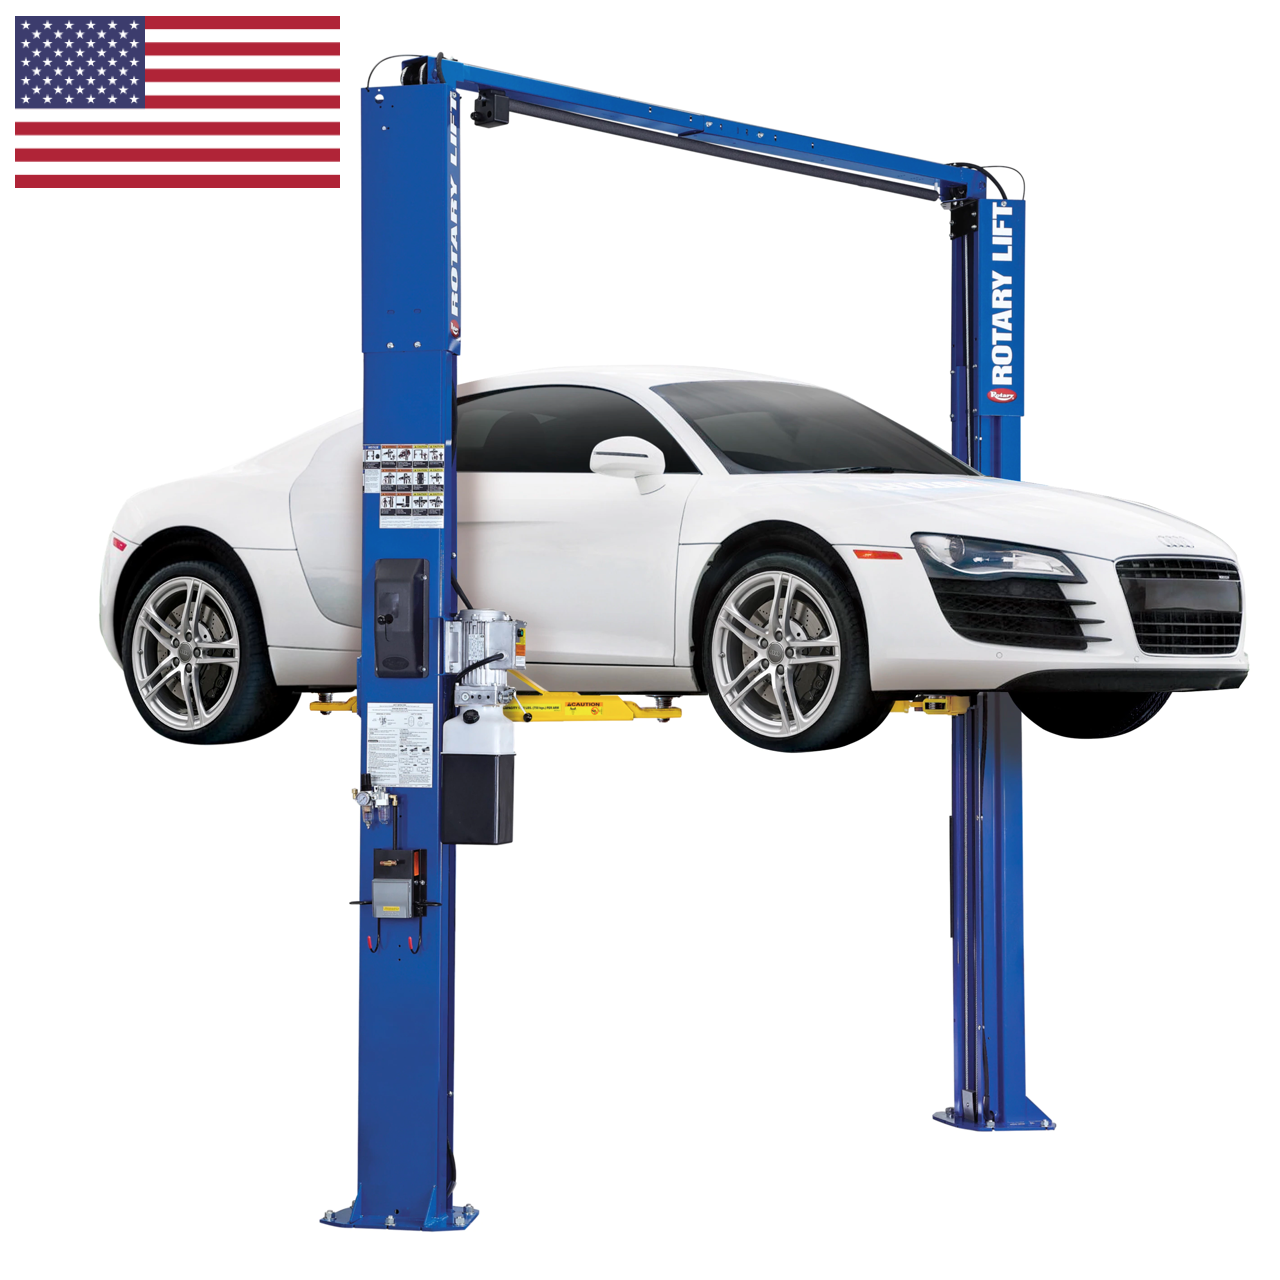 Rotary® SPOA7-LPA Certified Overhead 2-Post Lift (optional work station shown)